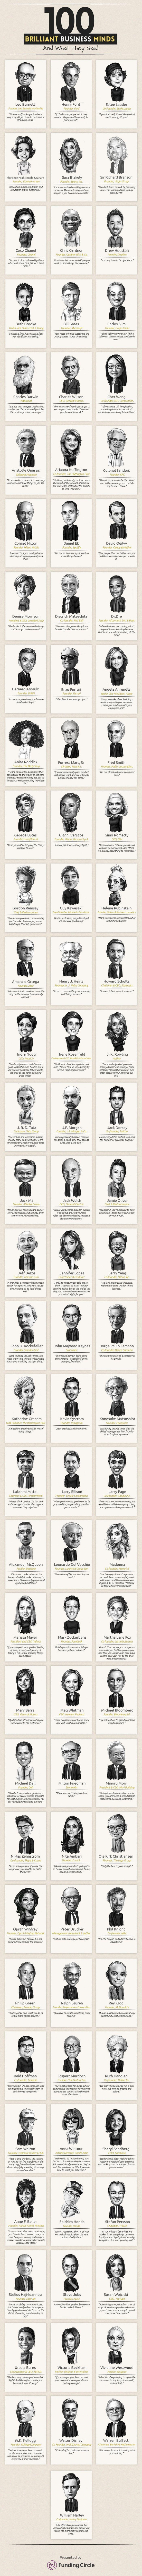 Infografik - 100 Brilliant Business Minds by Funding Circle